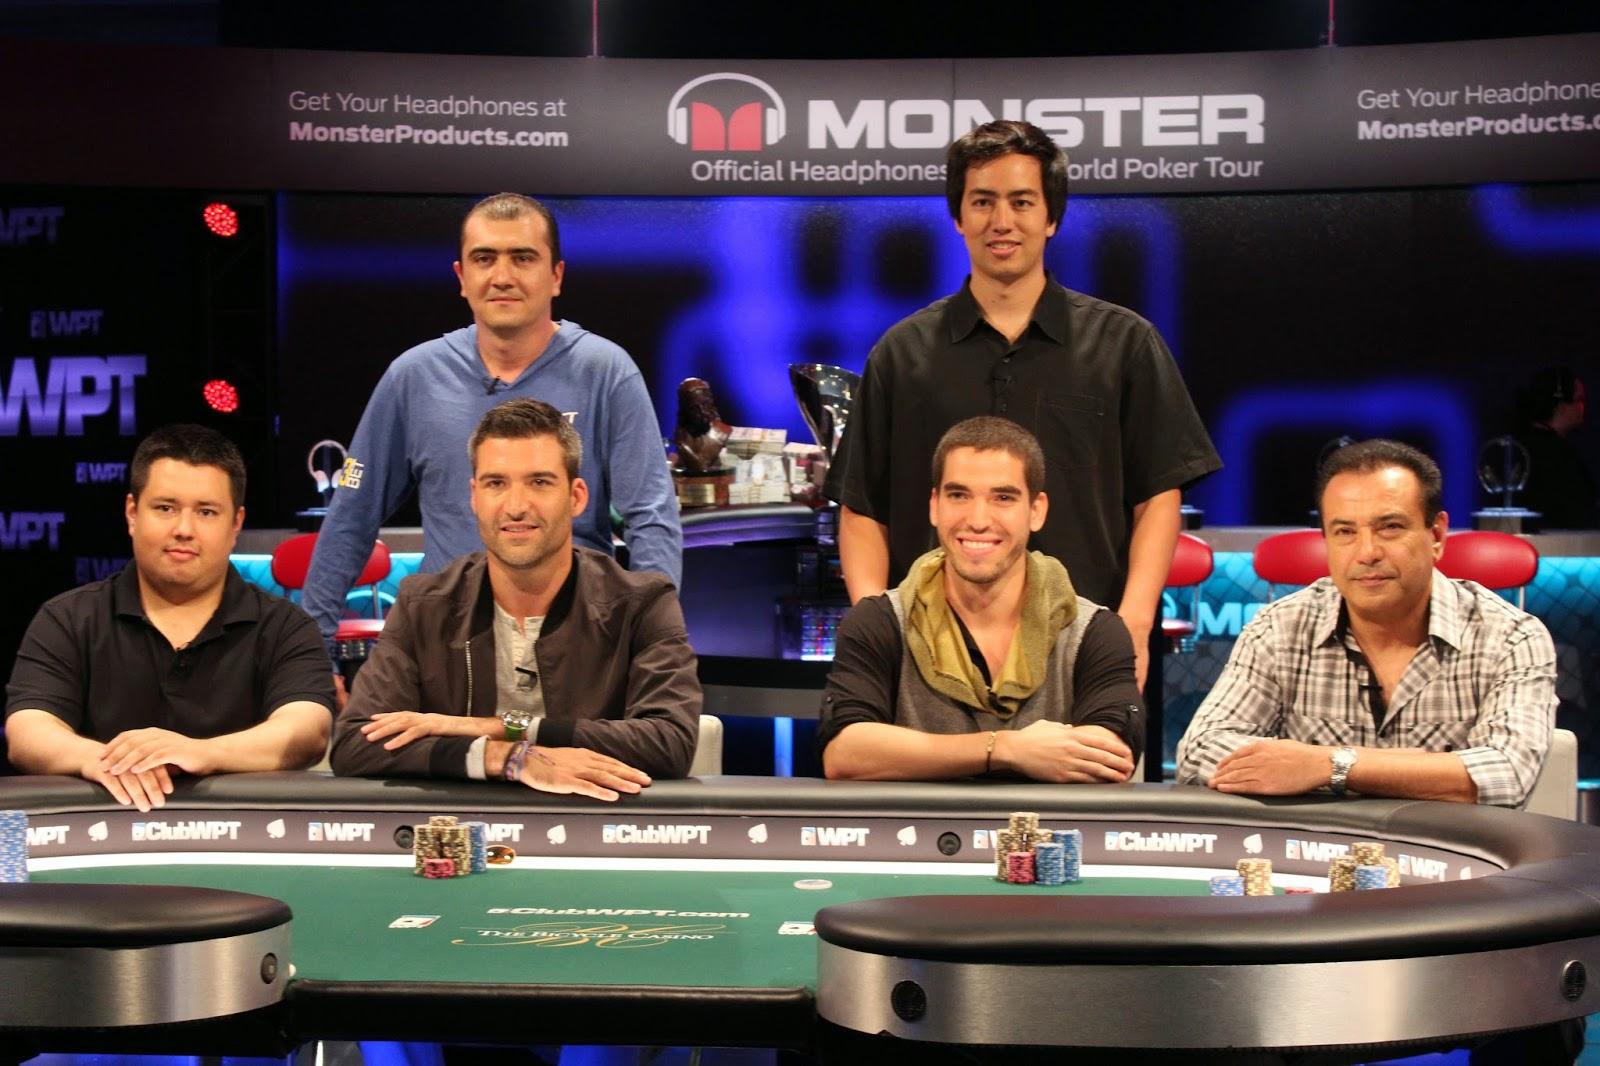 Poker tournament 2014 final table full party casino bonus code no deposit